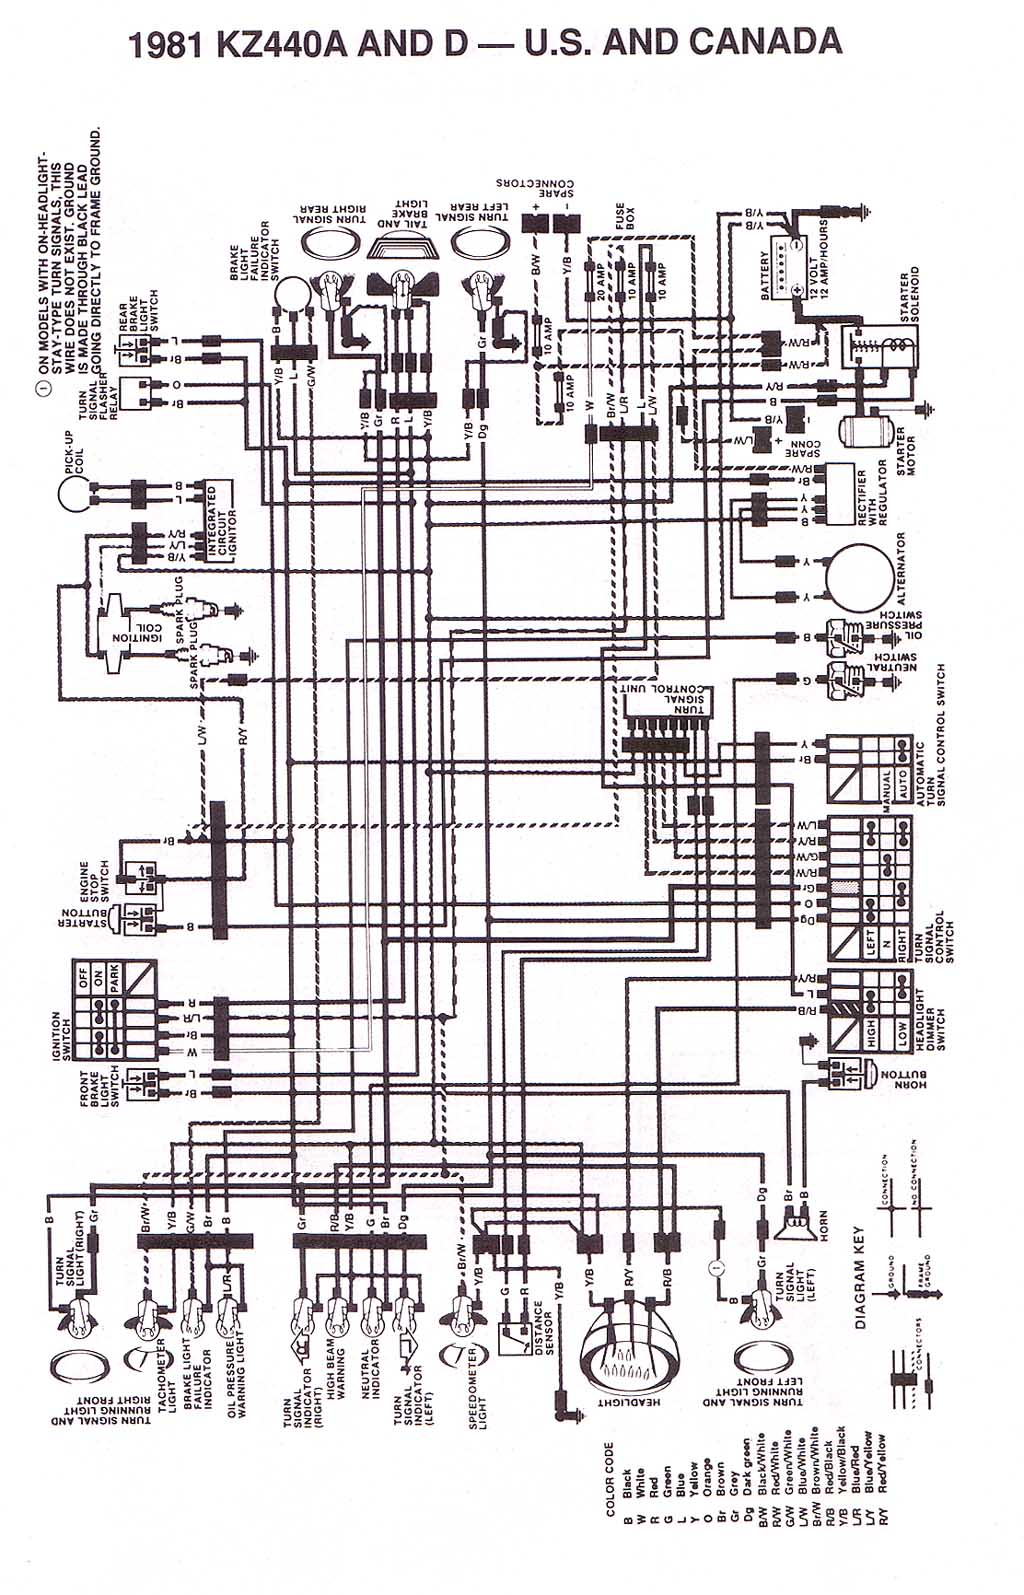 1980 kawasaki ltd 440 wiring diagram trusted wiring diagrams u2022 rh  caribbeanblues co 440 Case Tractor